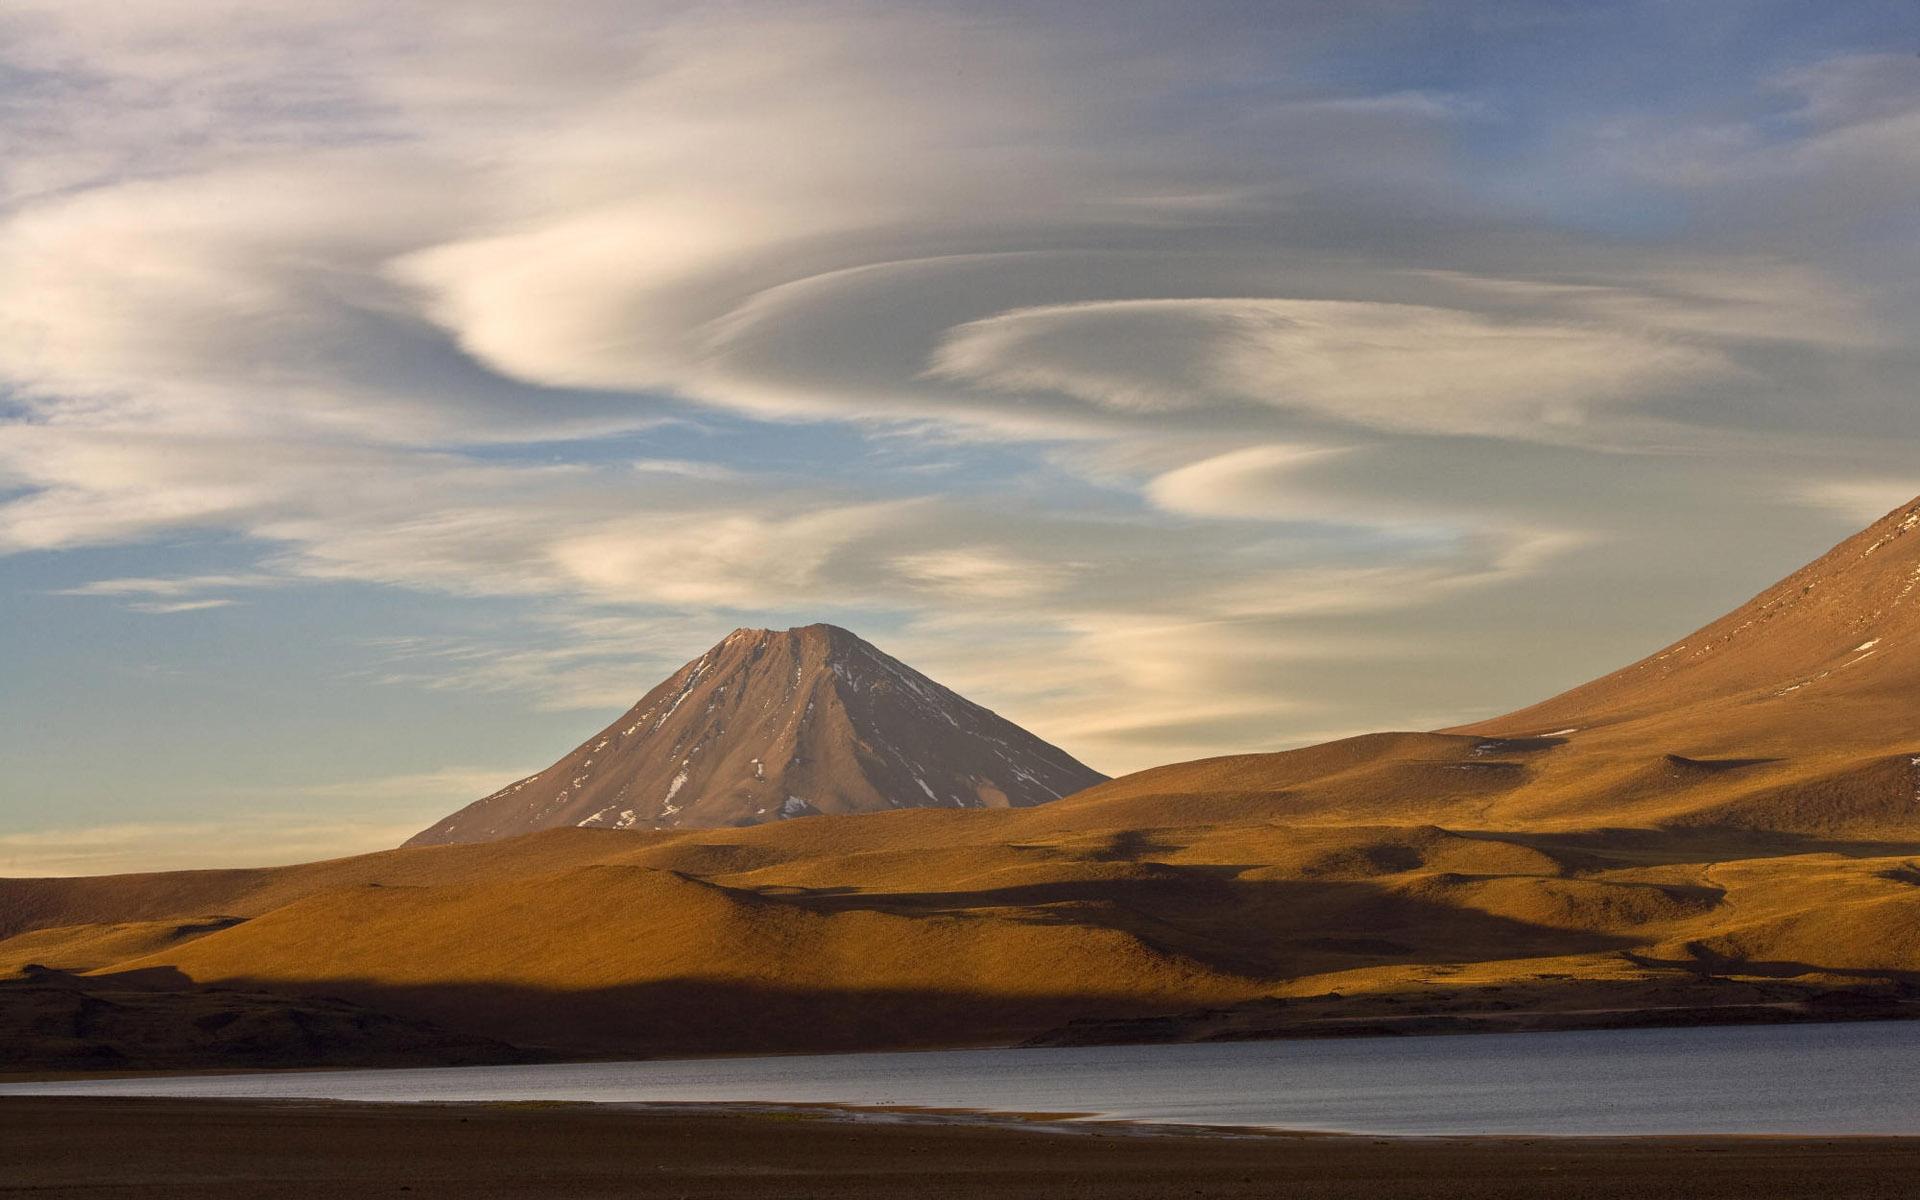 Un gran volcan - 1920x1200